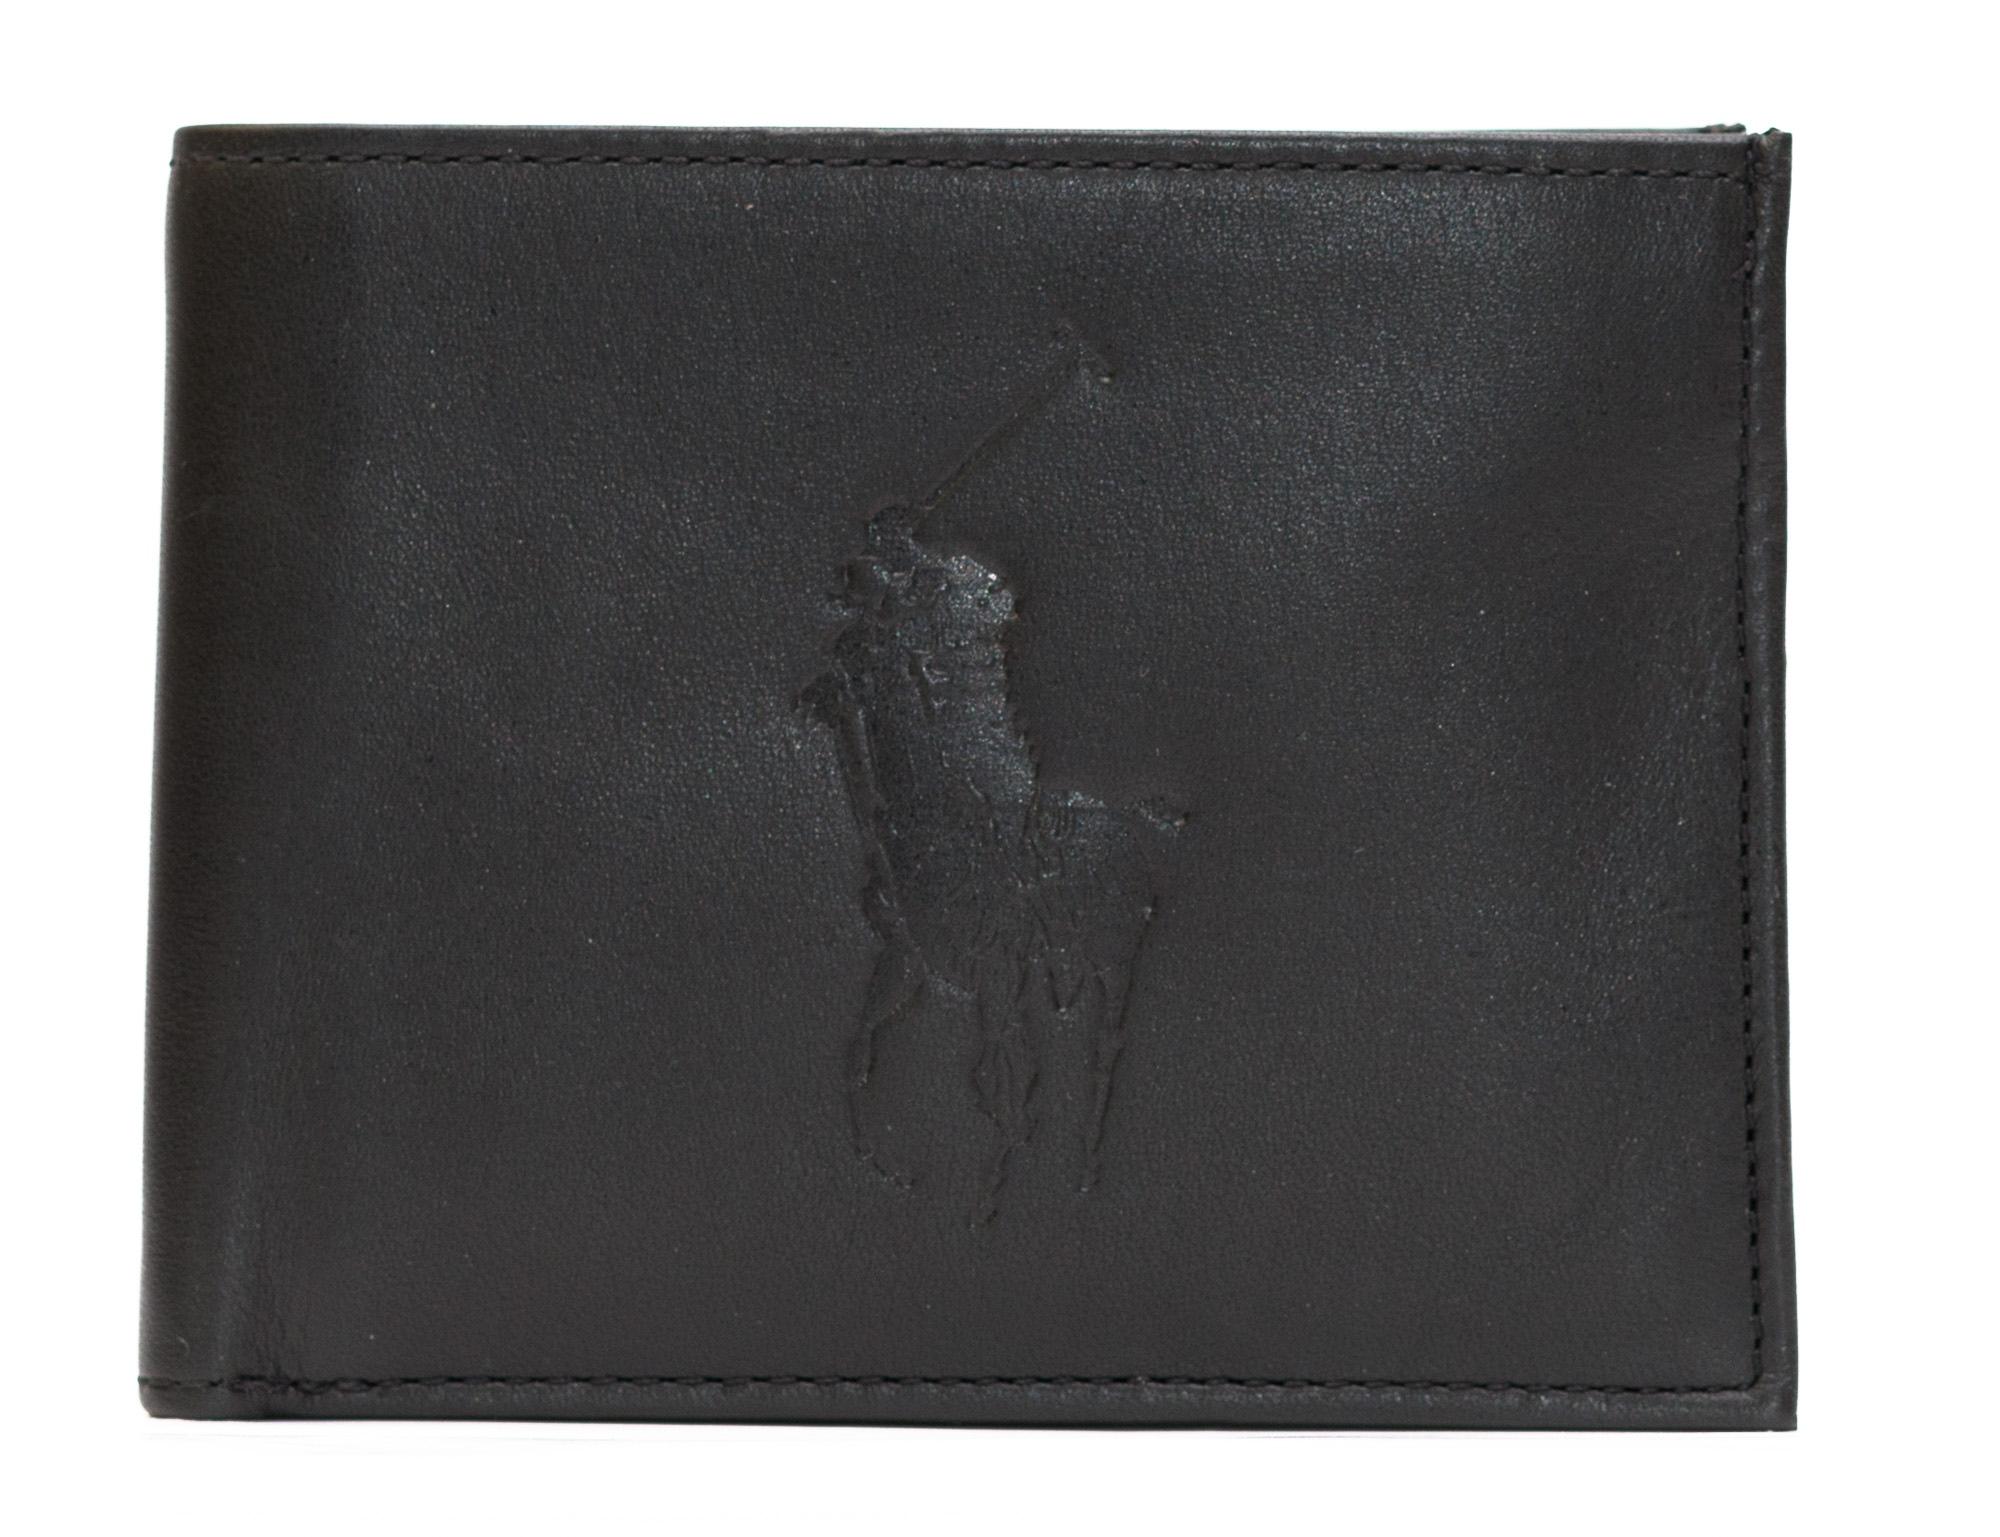 Мужские кошельки и портмоне - кошелек Polo Ralph Lauren RL10217 124f54e3f79